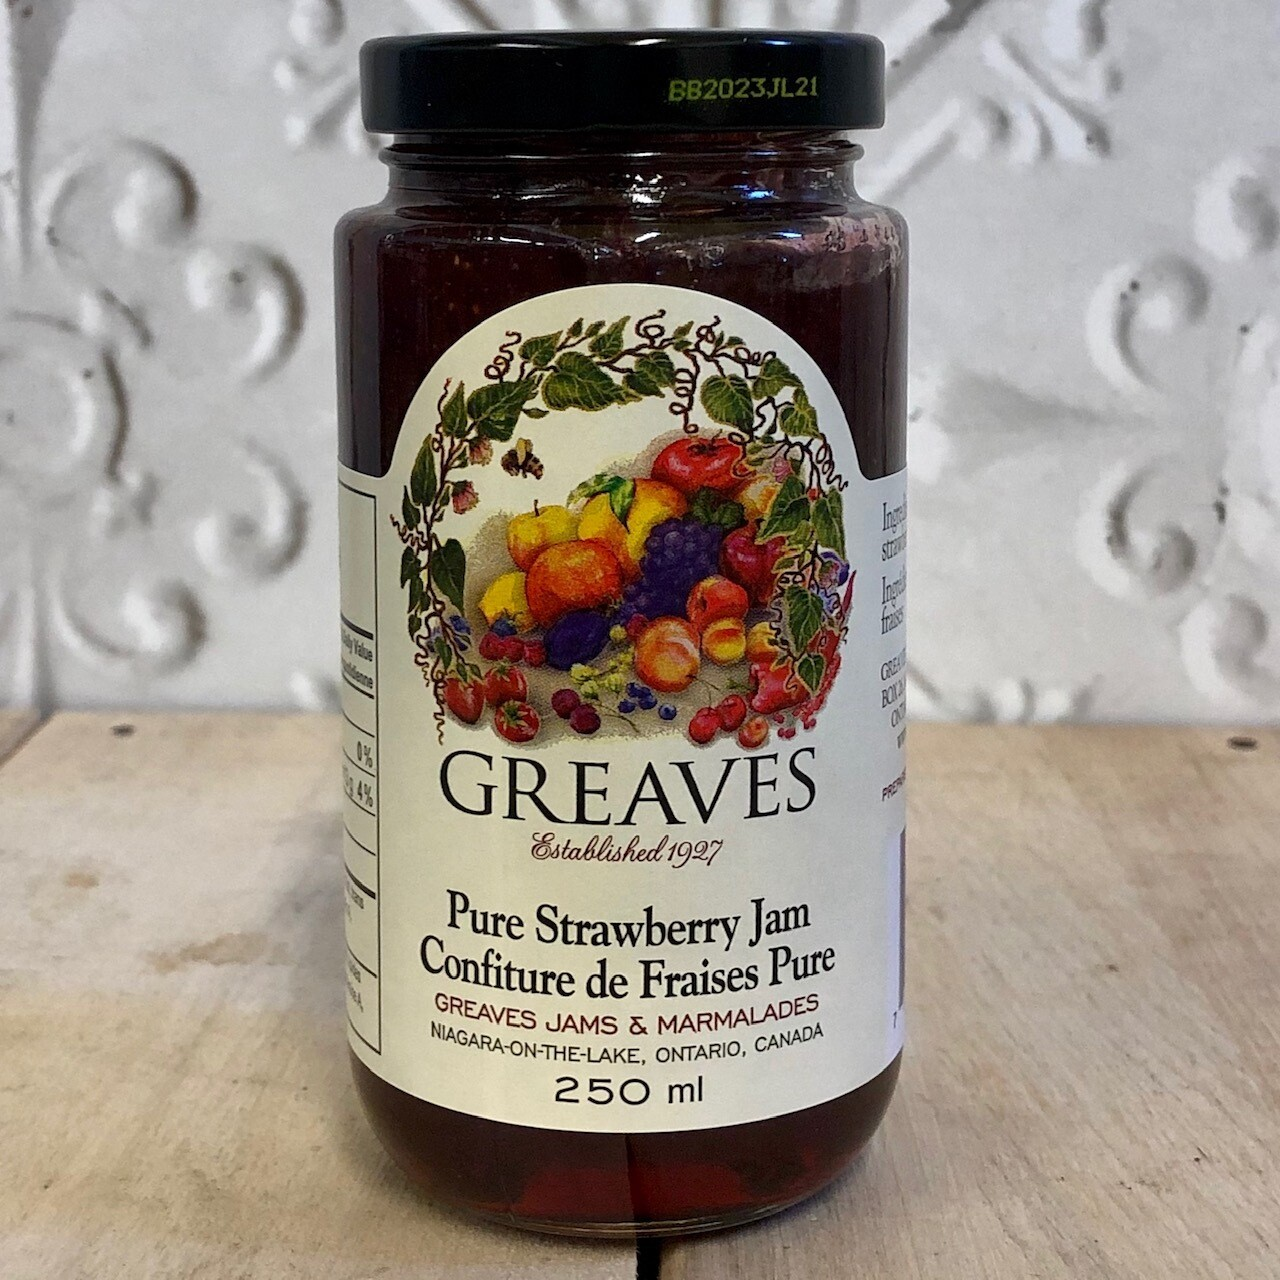 GREAVES Pure Strawberry Jam 250ml